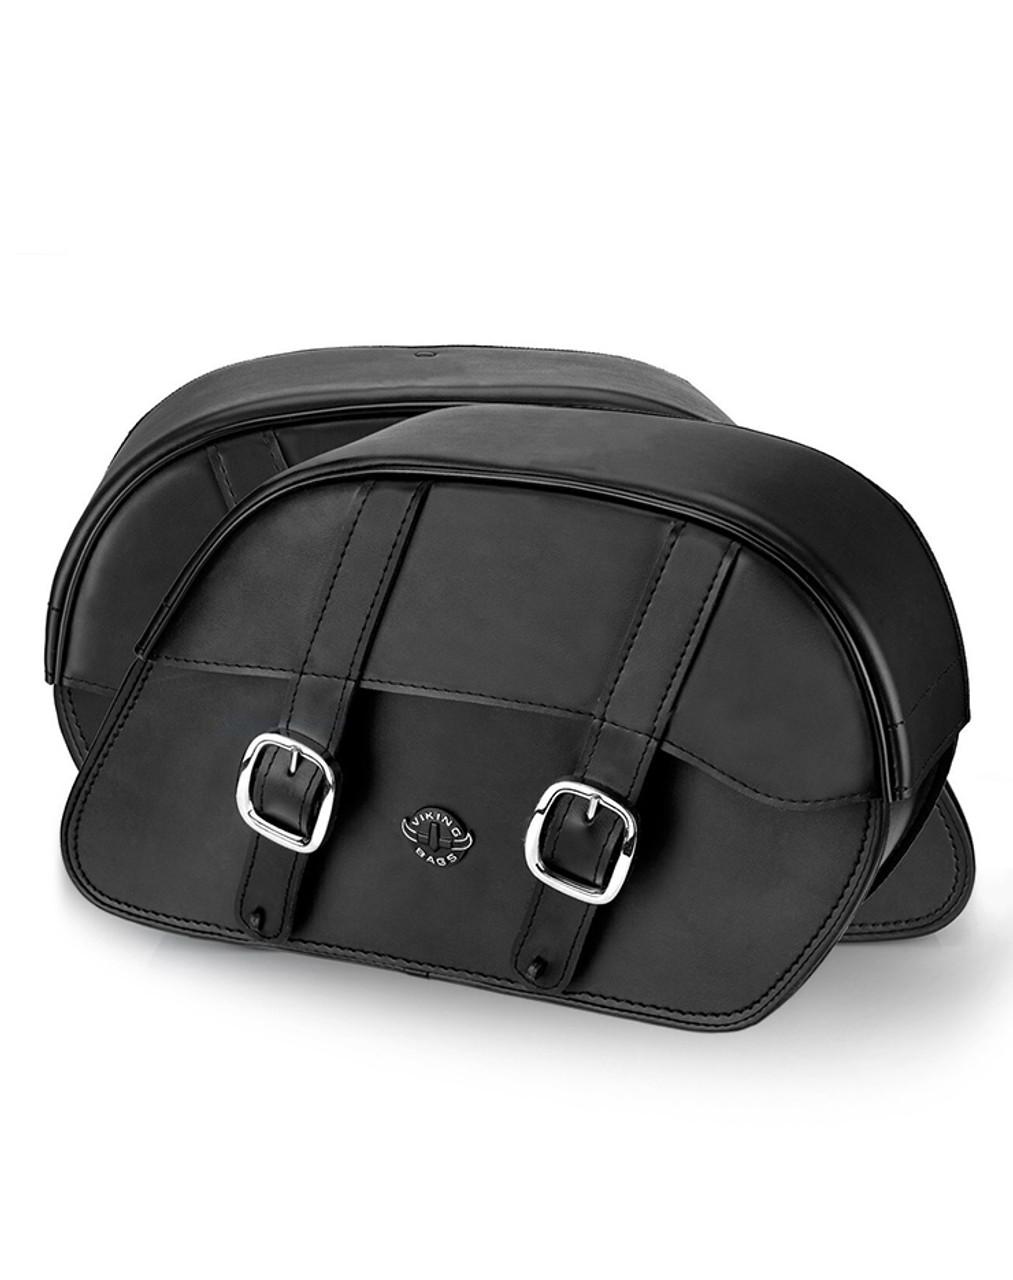 Yamaha Startoliner XV 1900 Slanted Medium Motorcycle Saddlebags Both Bags View